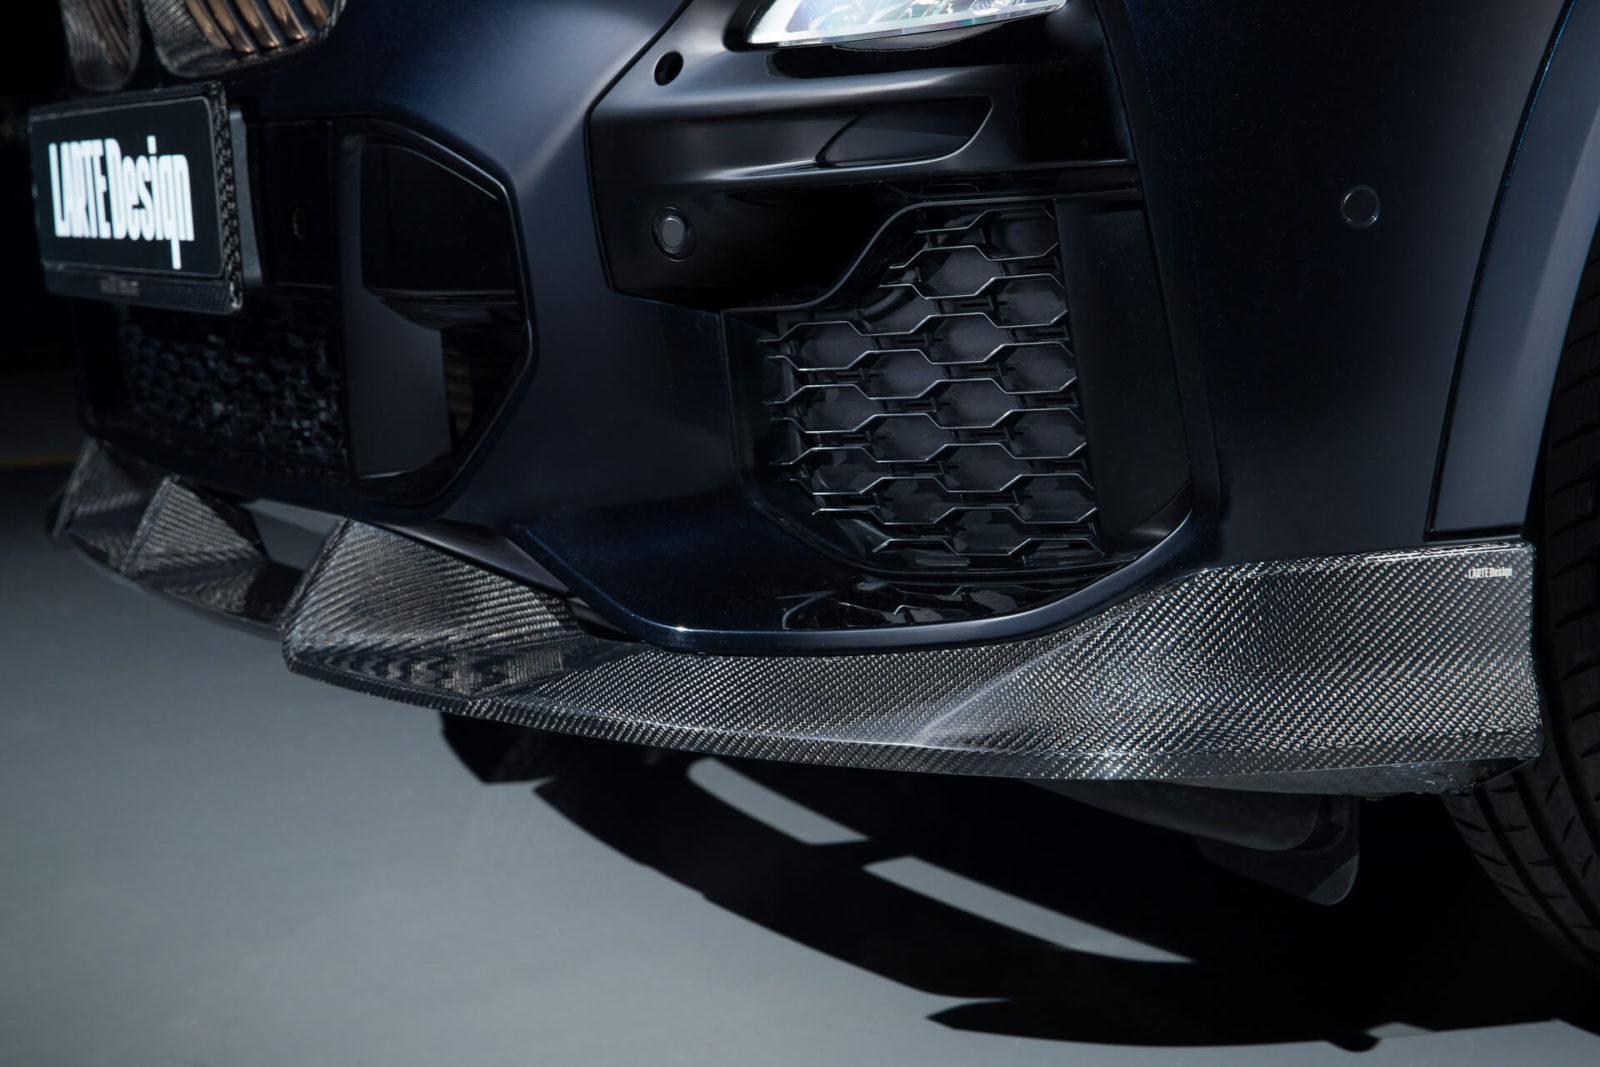 Larte Design body kit for BMW X5(G05) new style